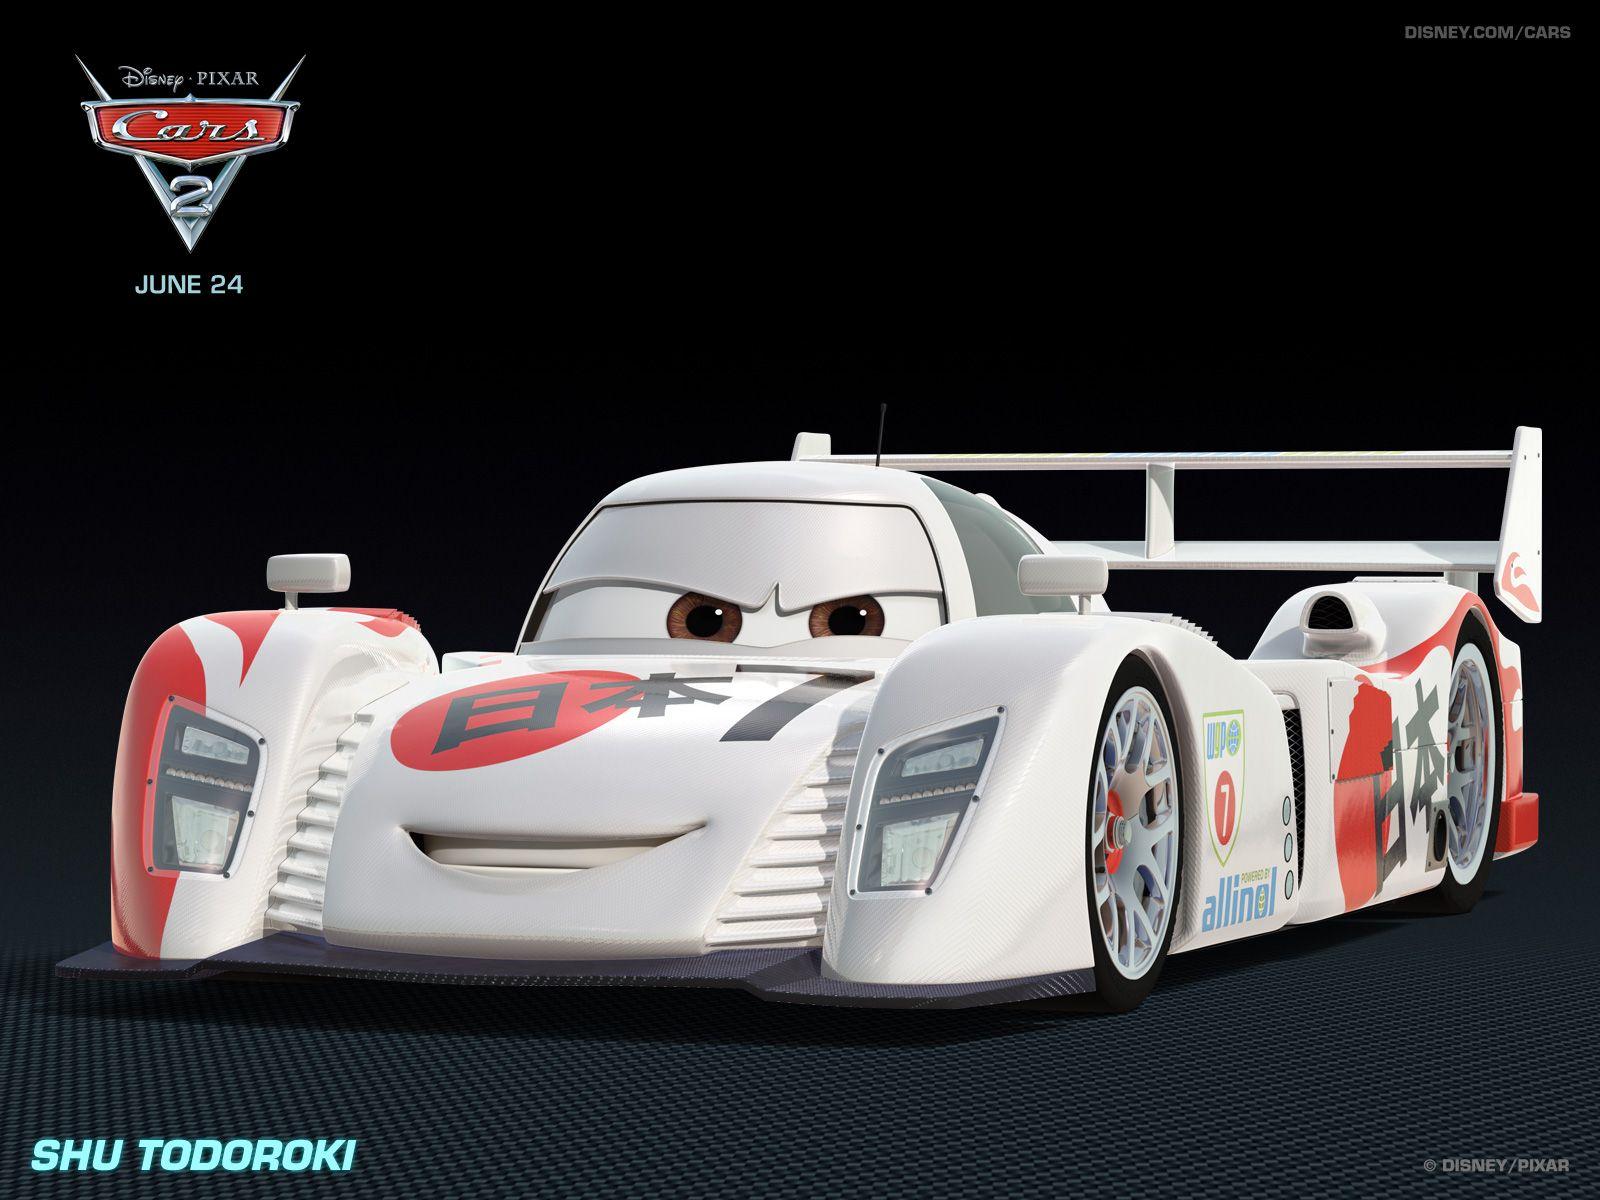 Cars disney pixar flash mcqueen fond d ecran gratuit diy papier pinterest flash mcqueen - Nom voitures cars 2 ...